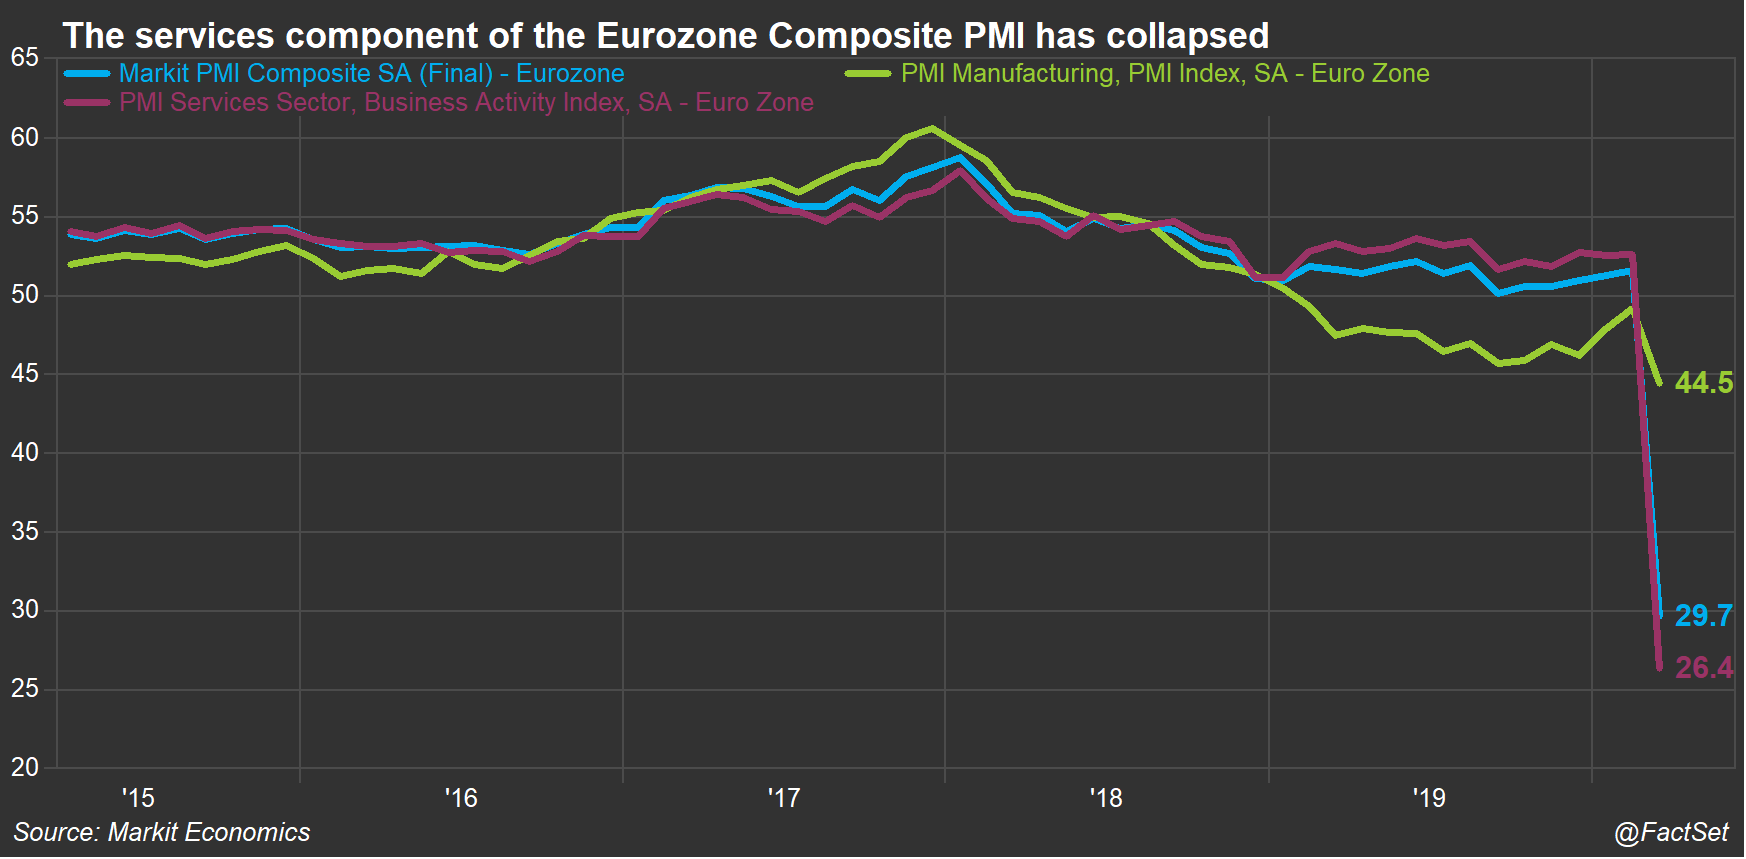 Europe Composite PMI